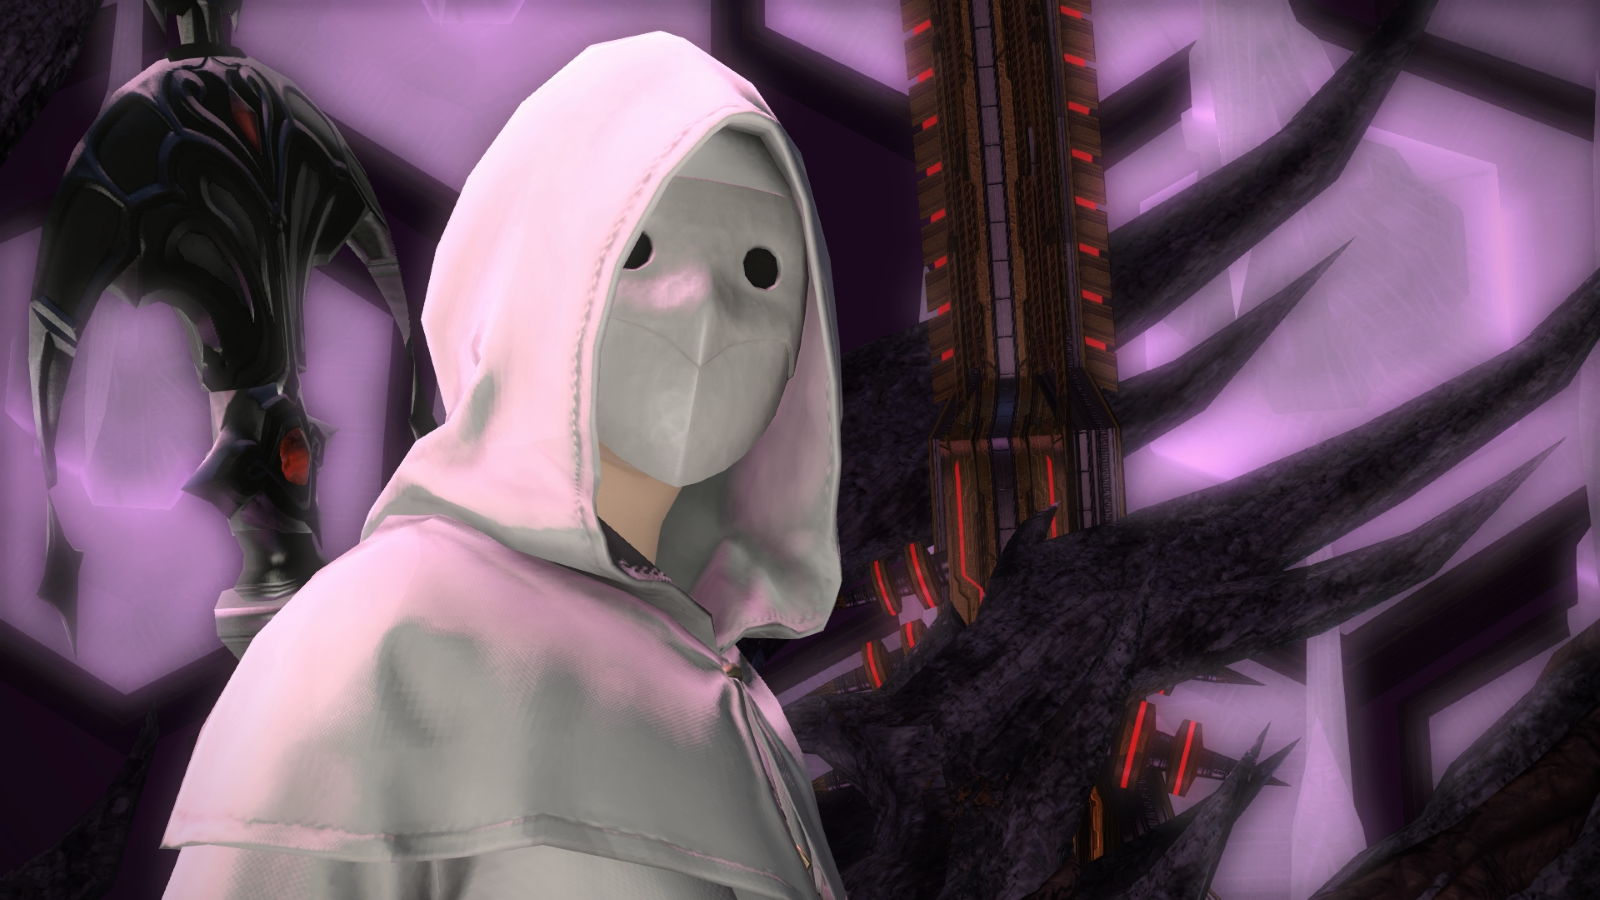 Final Fantasy XIV Patch 3.3 Details Revealed